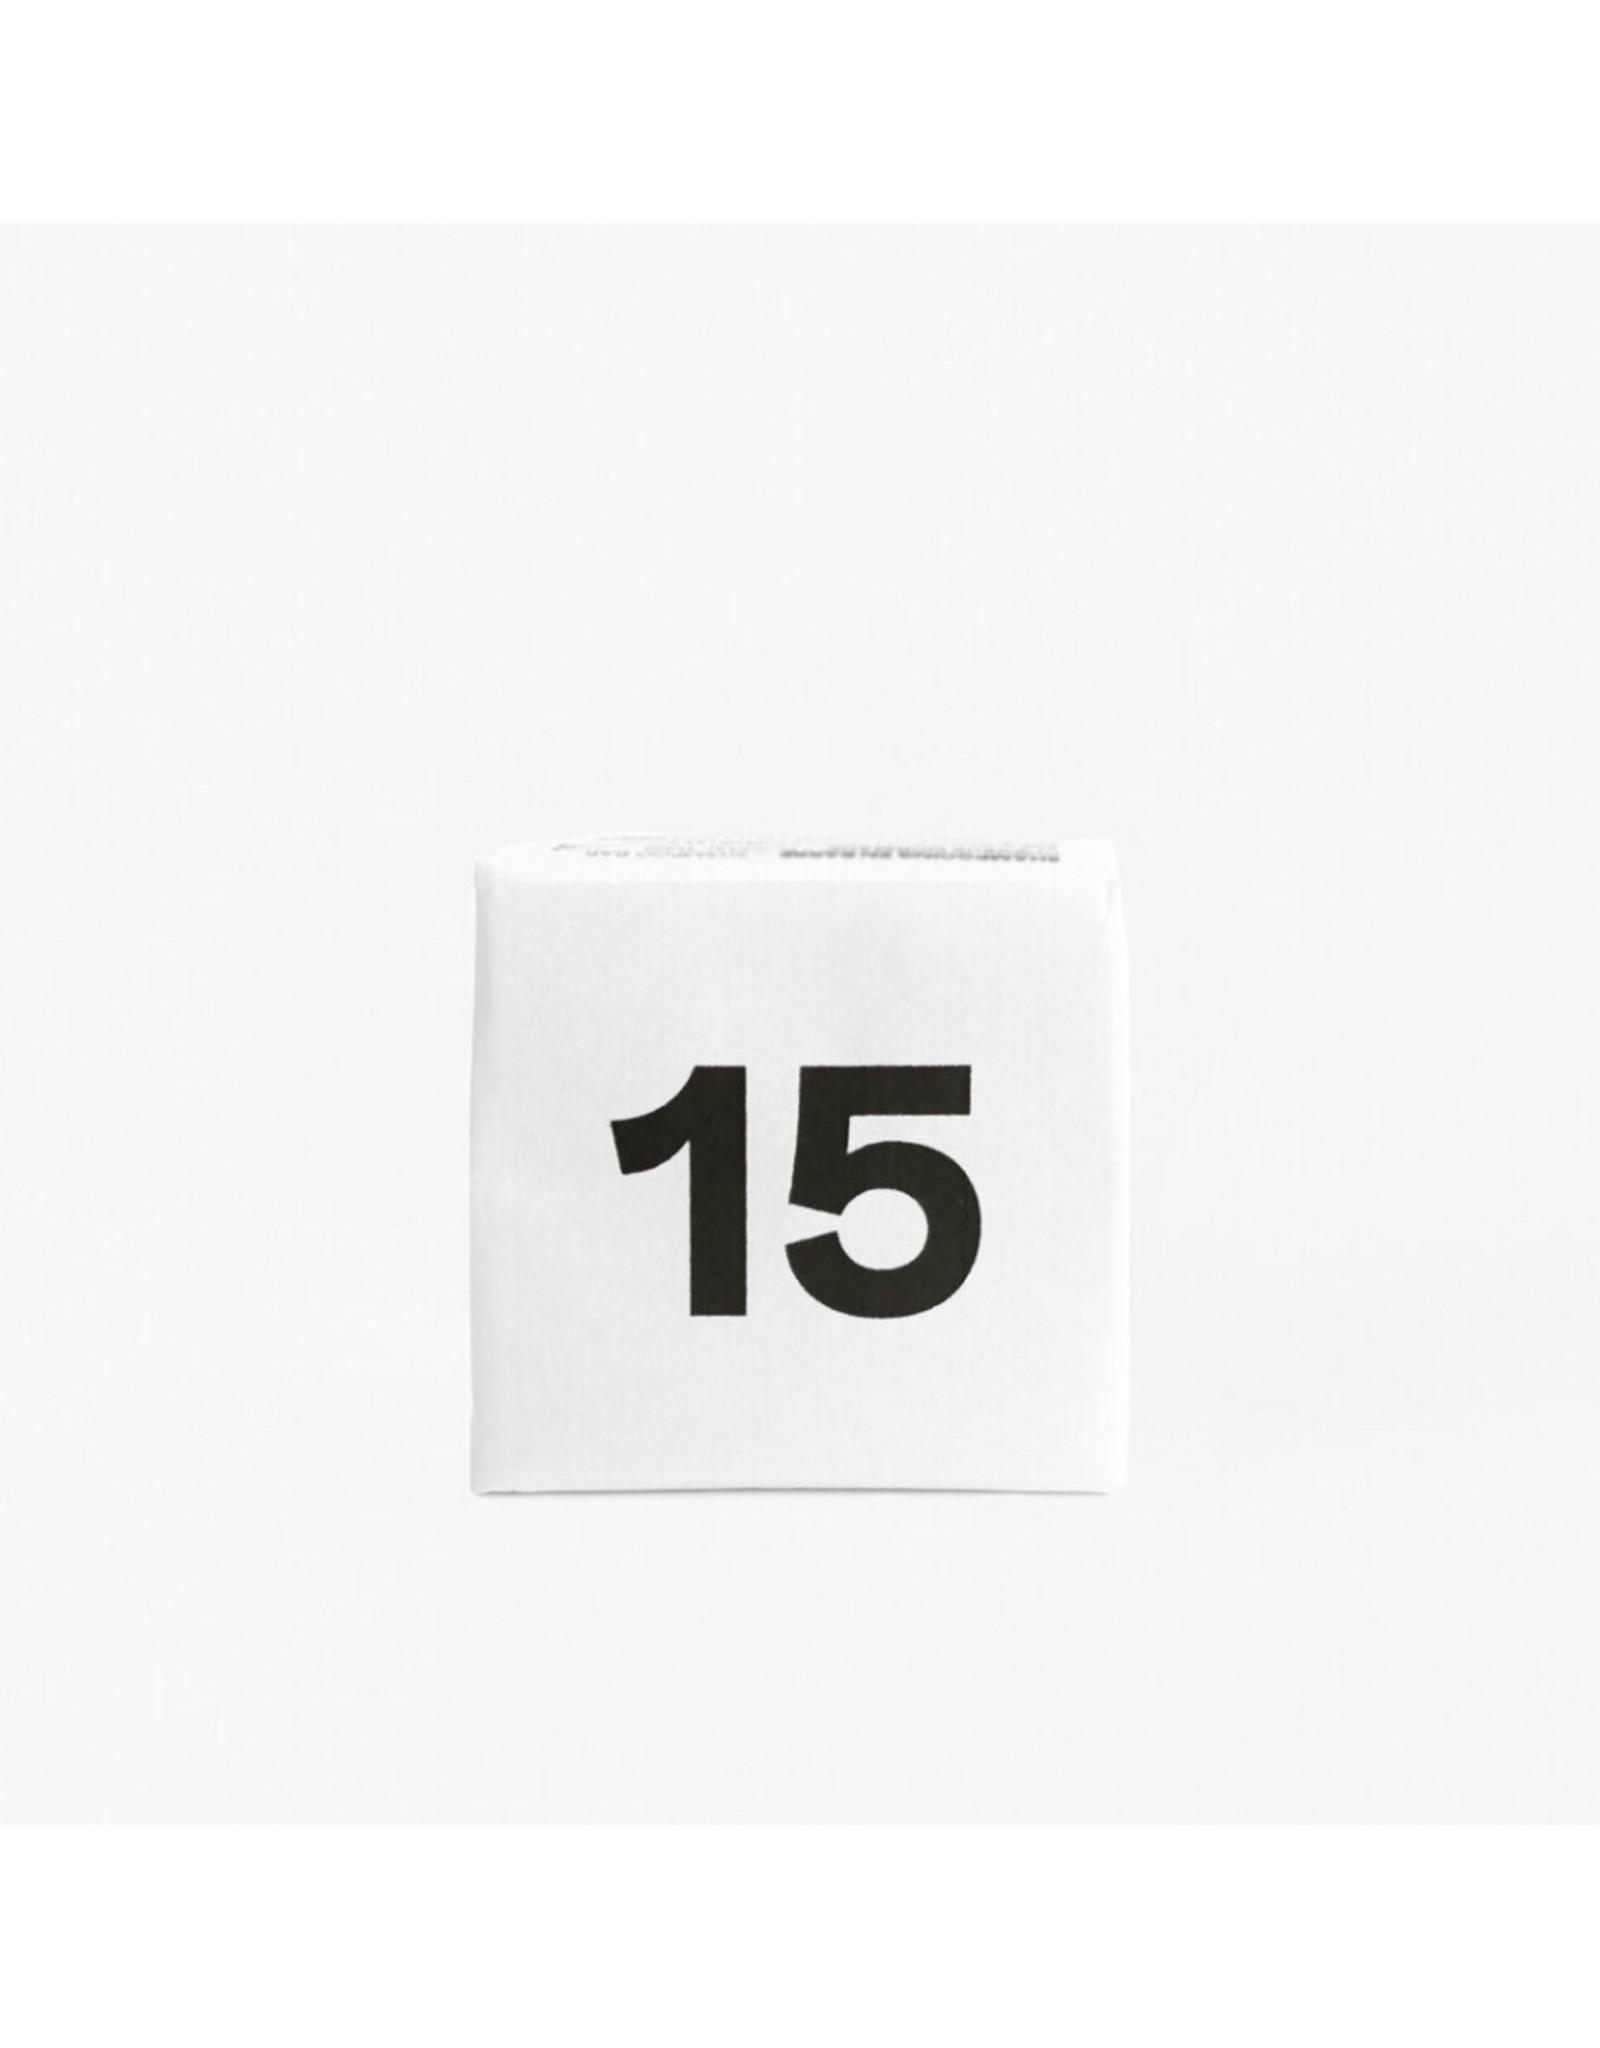 Suum Revitalisant en barre #15 sans odeur